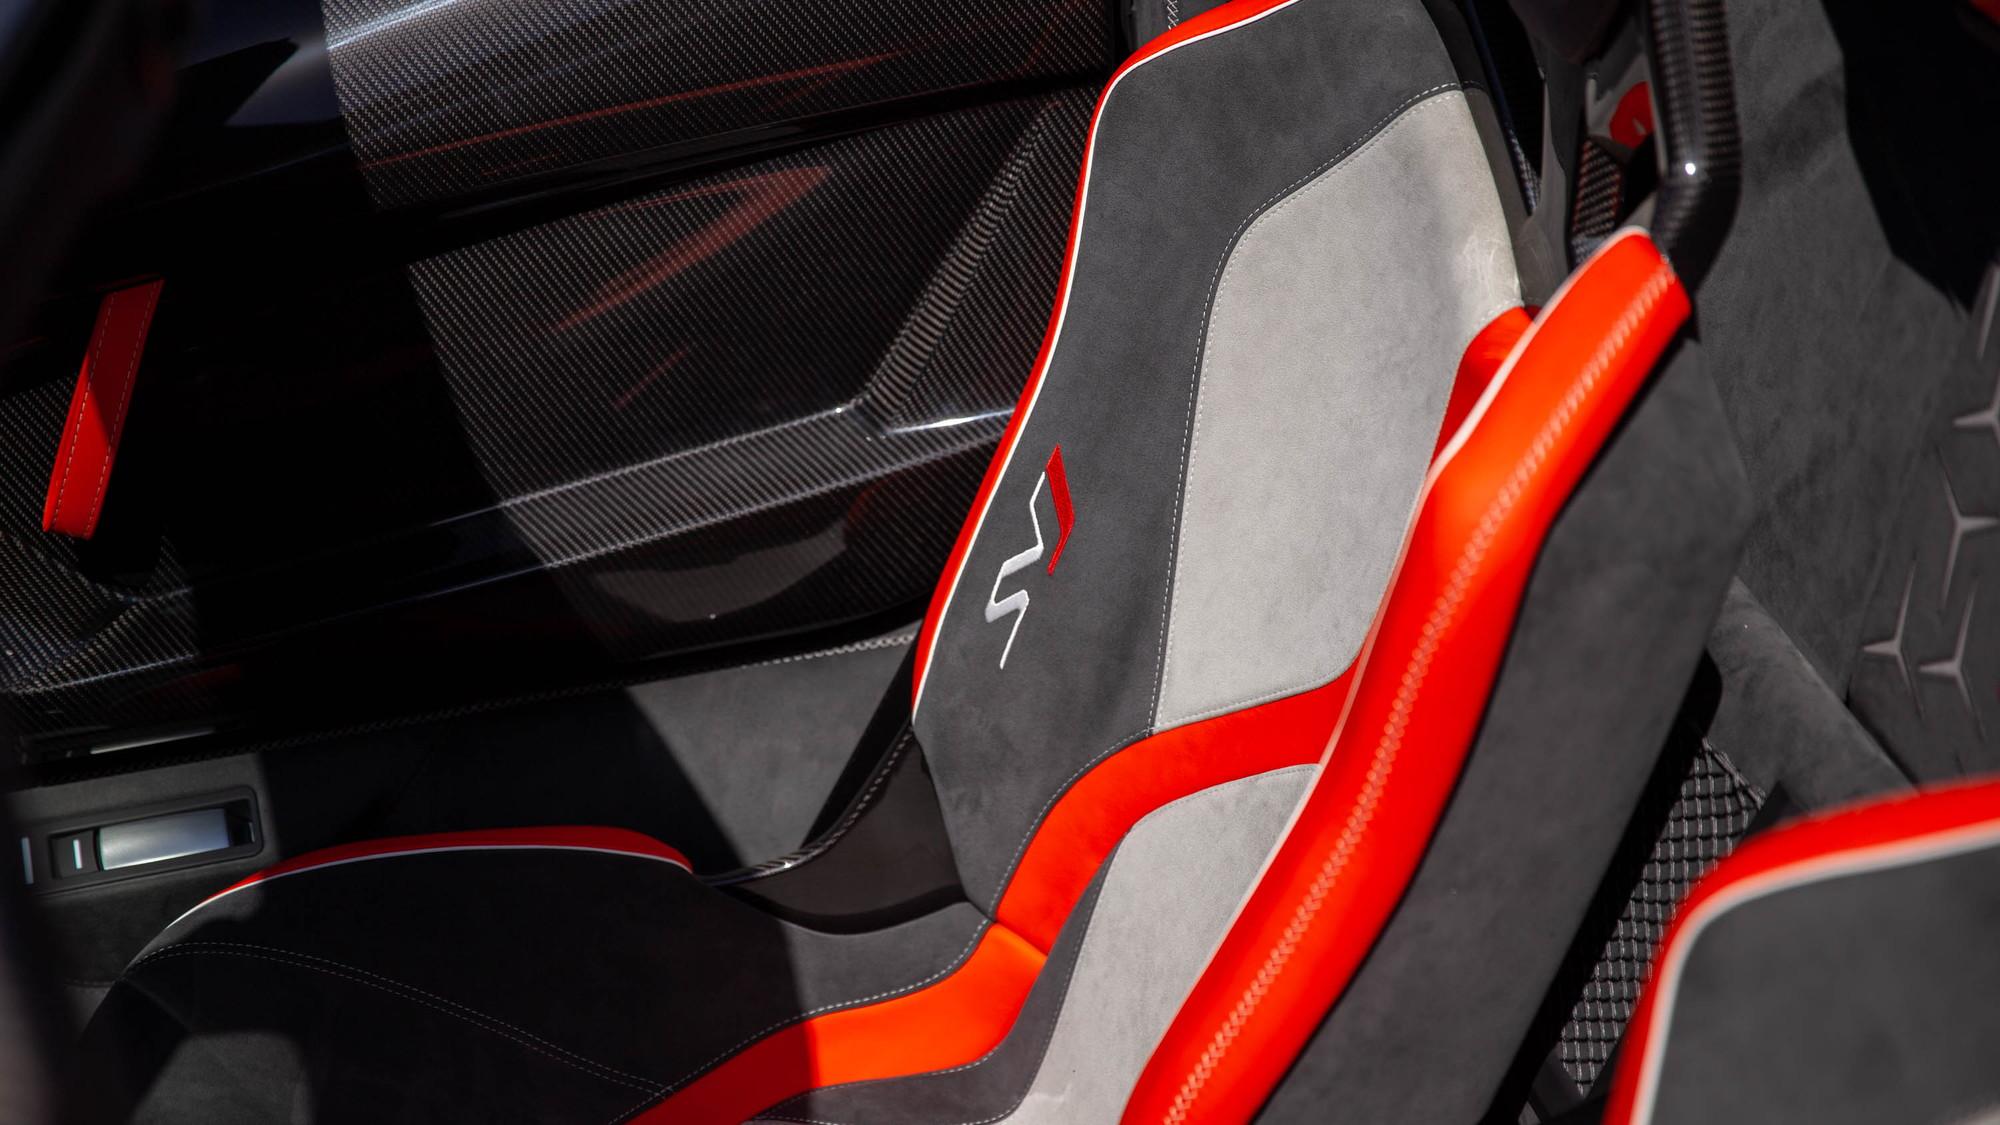 Lamborghini unveiled a pair of special cars at Monterey Car Week